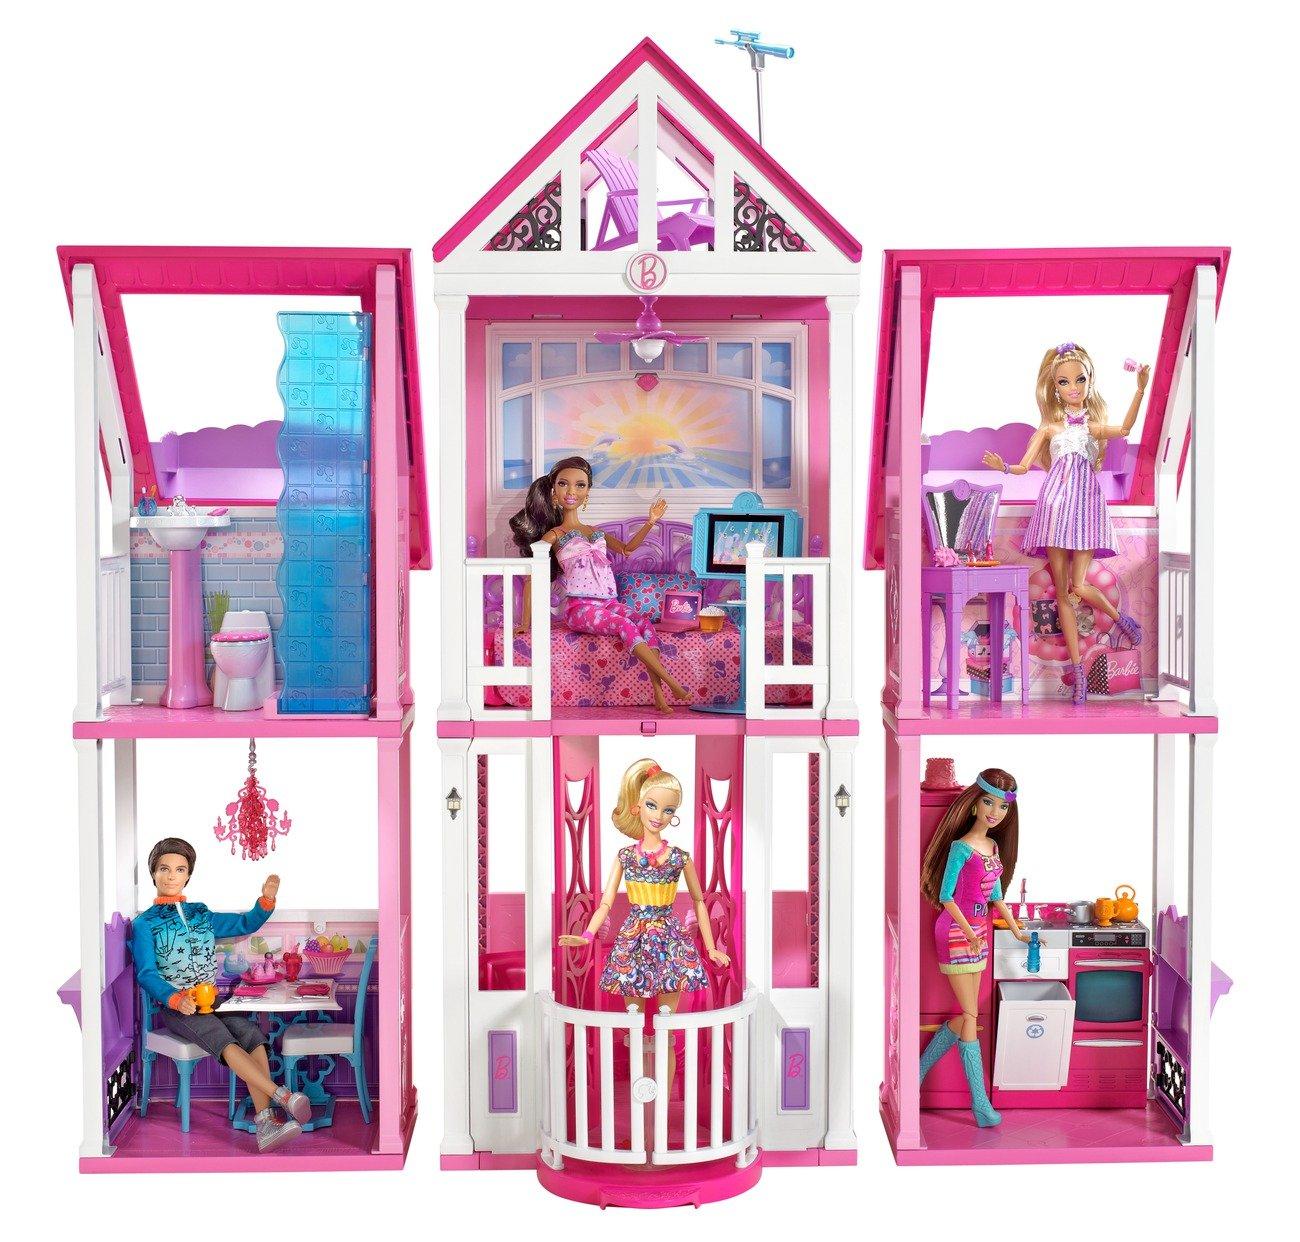 Maison barbie malibu - Maison de reve de barbie ...